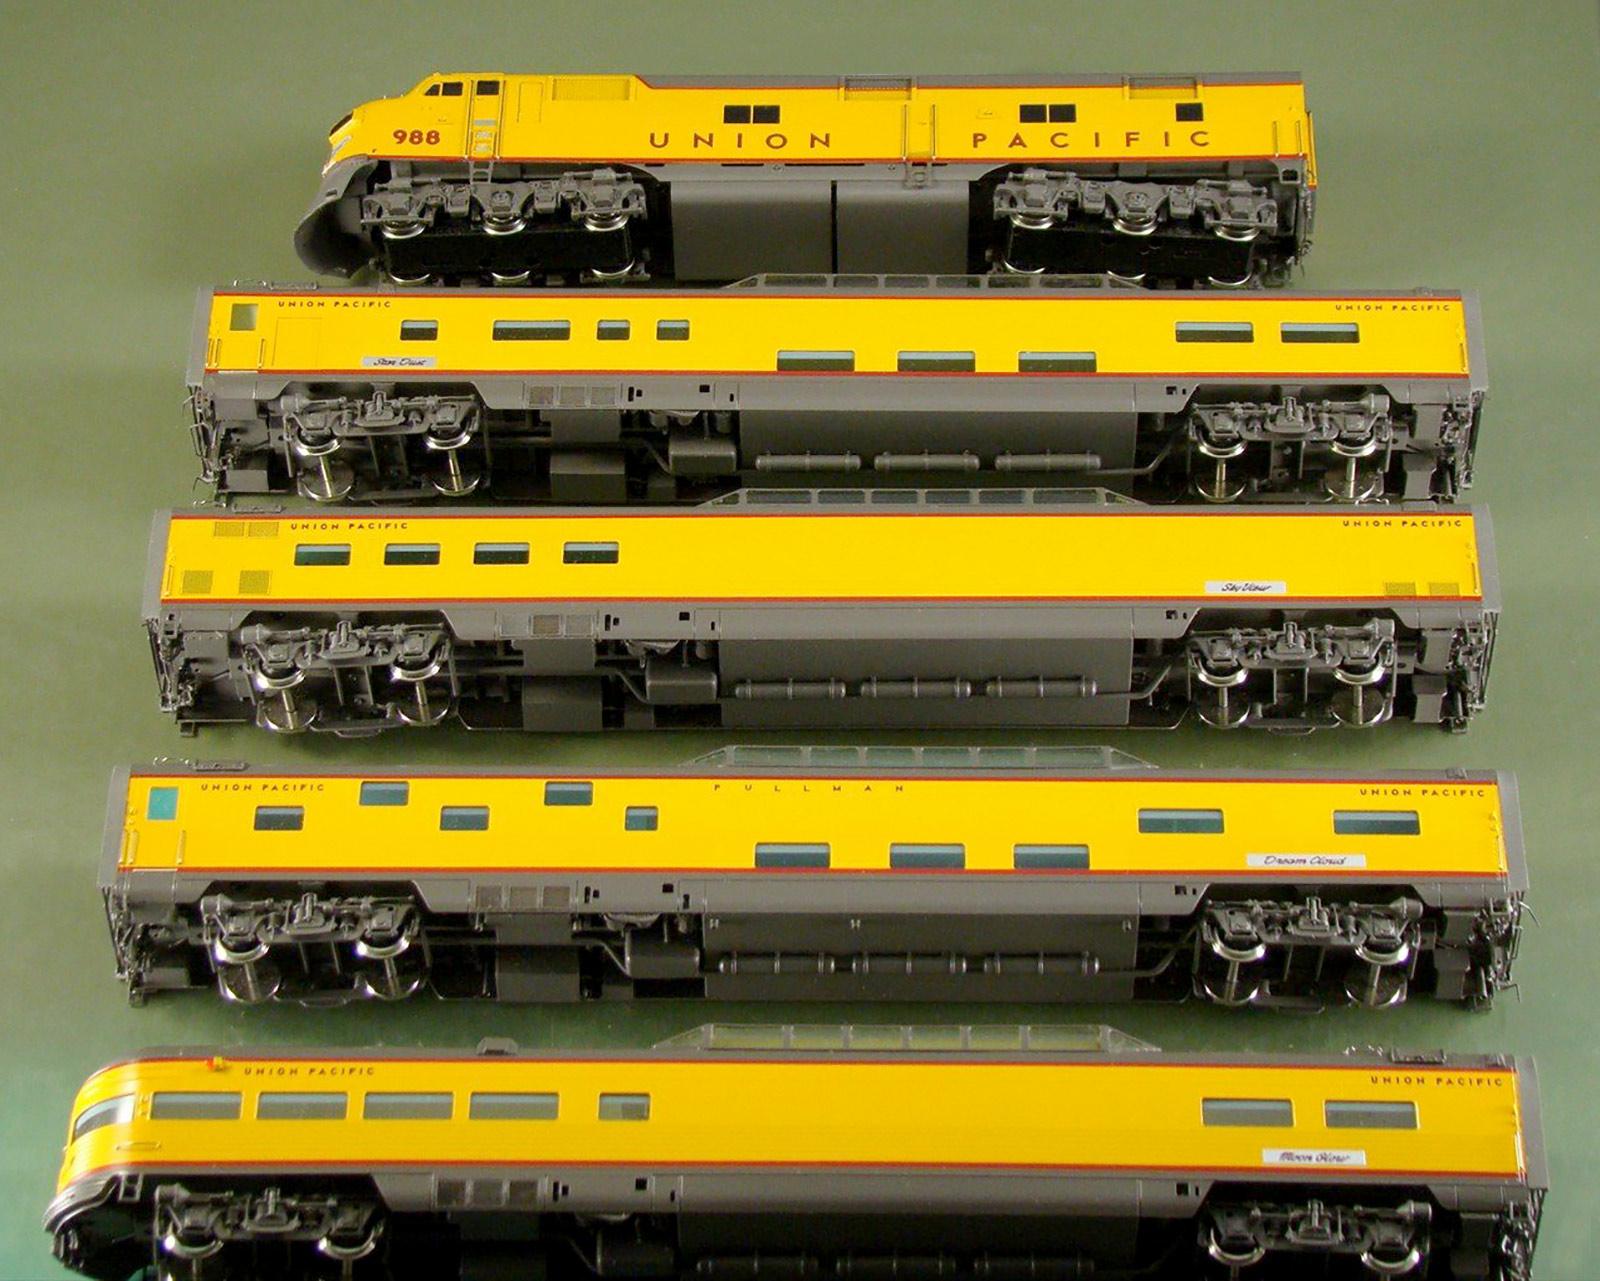 The 1947-1949 General Motors Train of Tomorrow